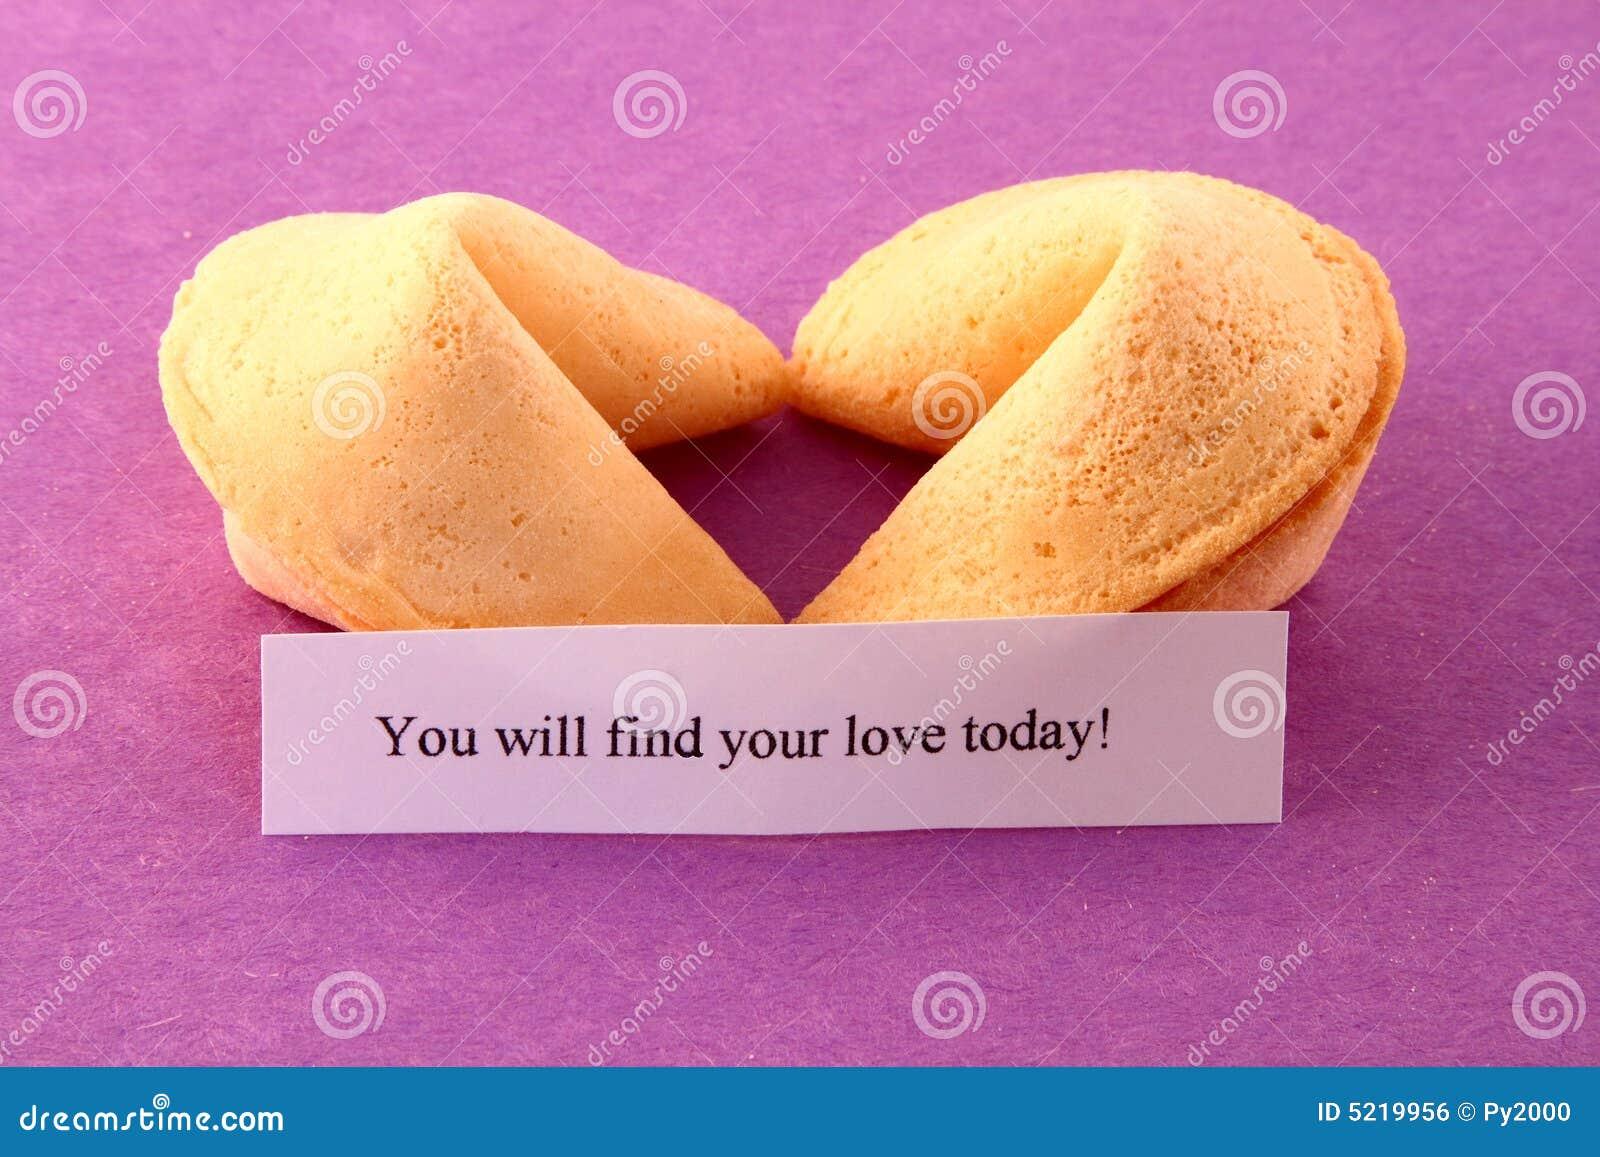 Biscuits de fortune en forme de coeur